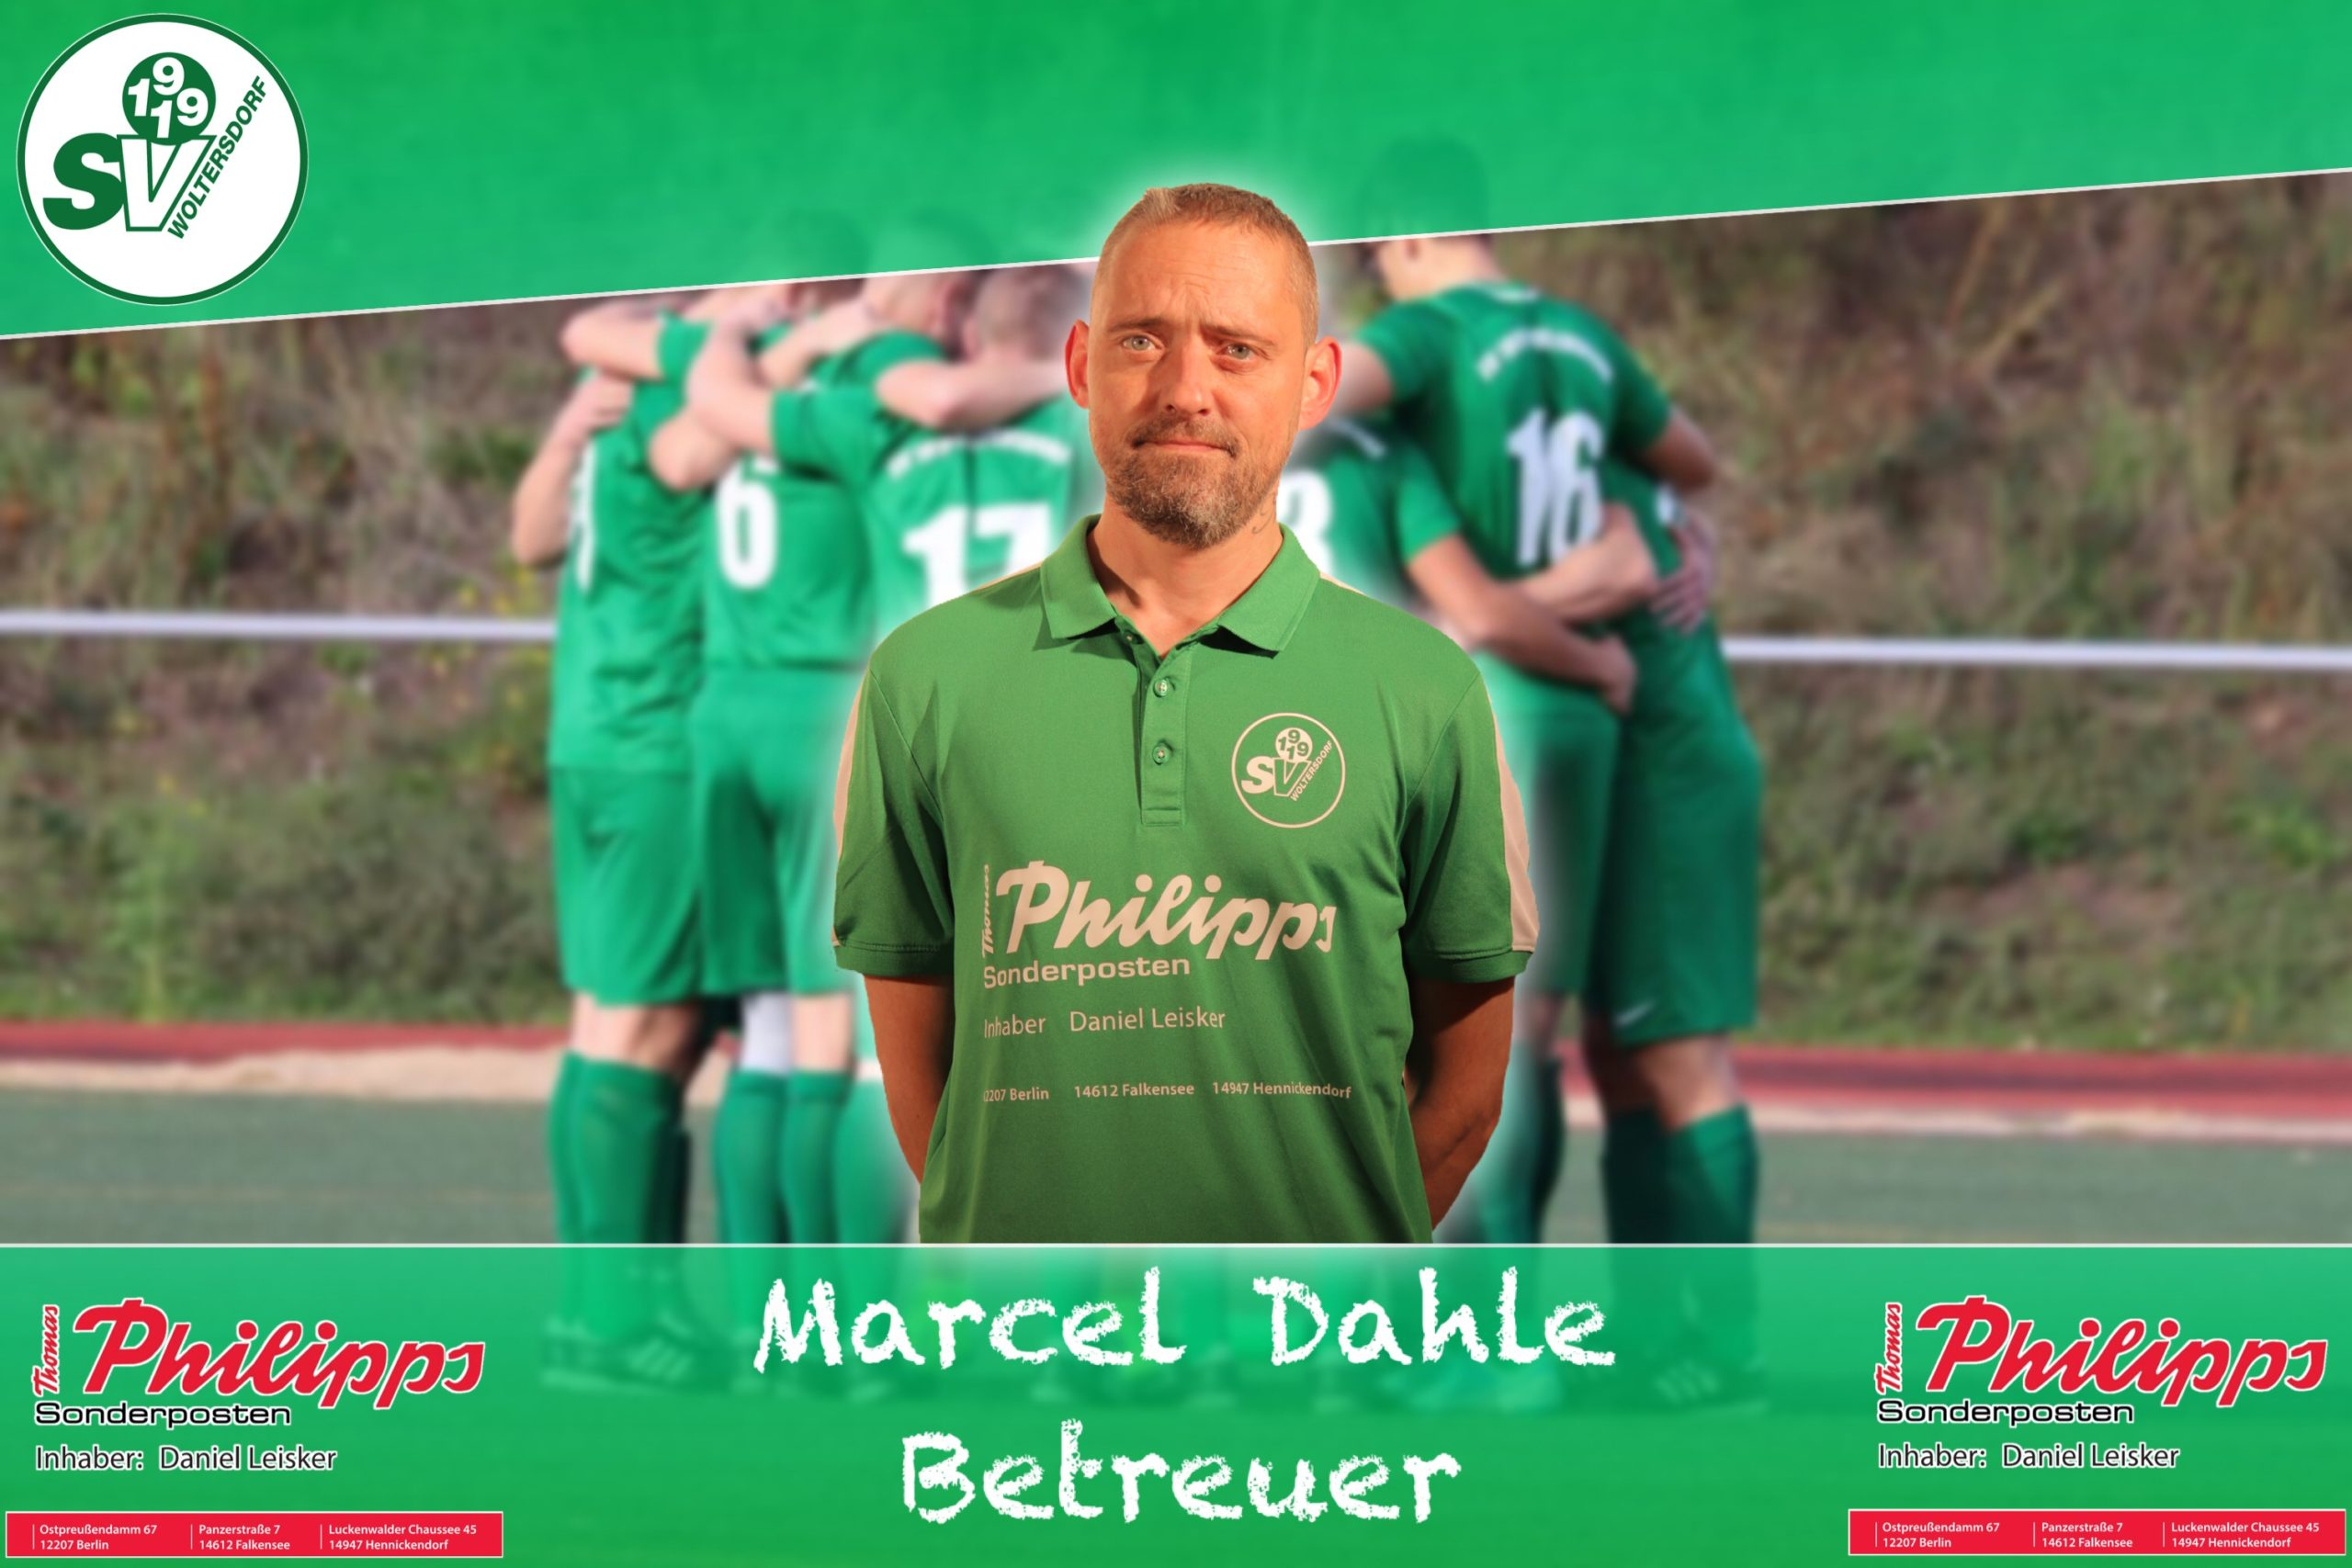 Marcel Dahle